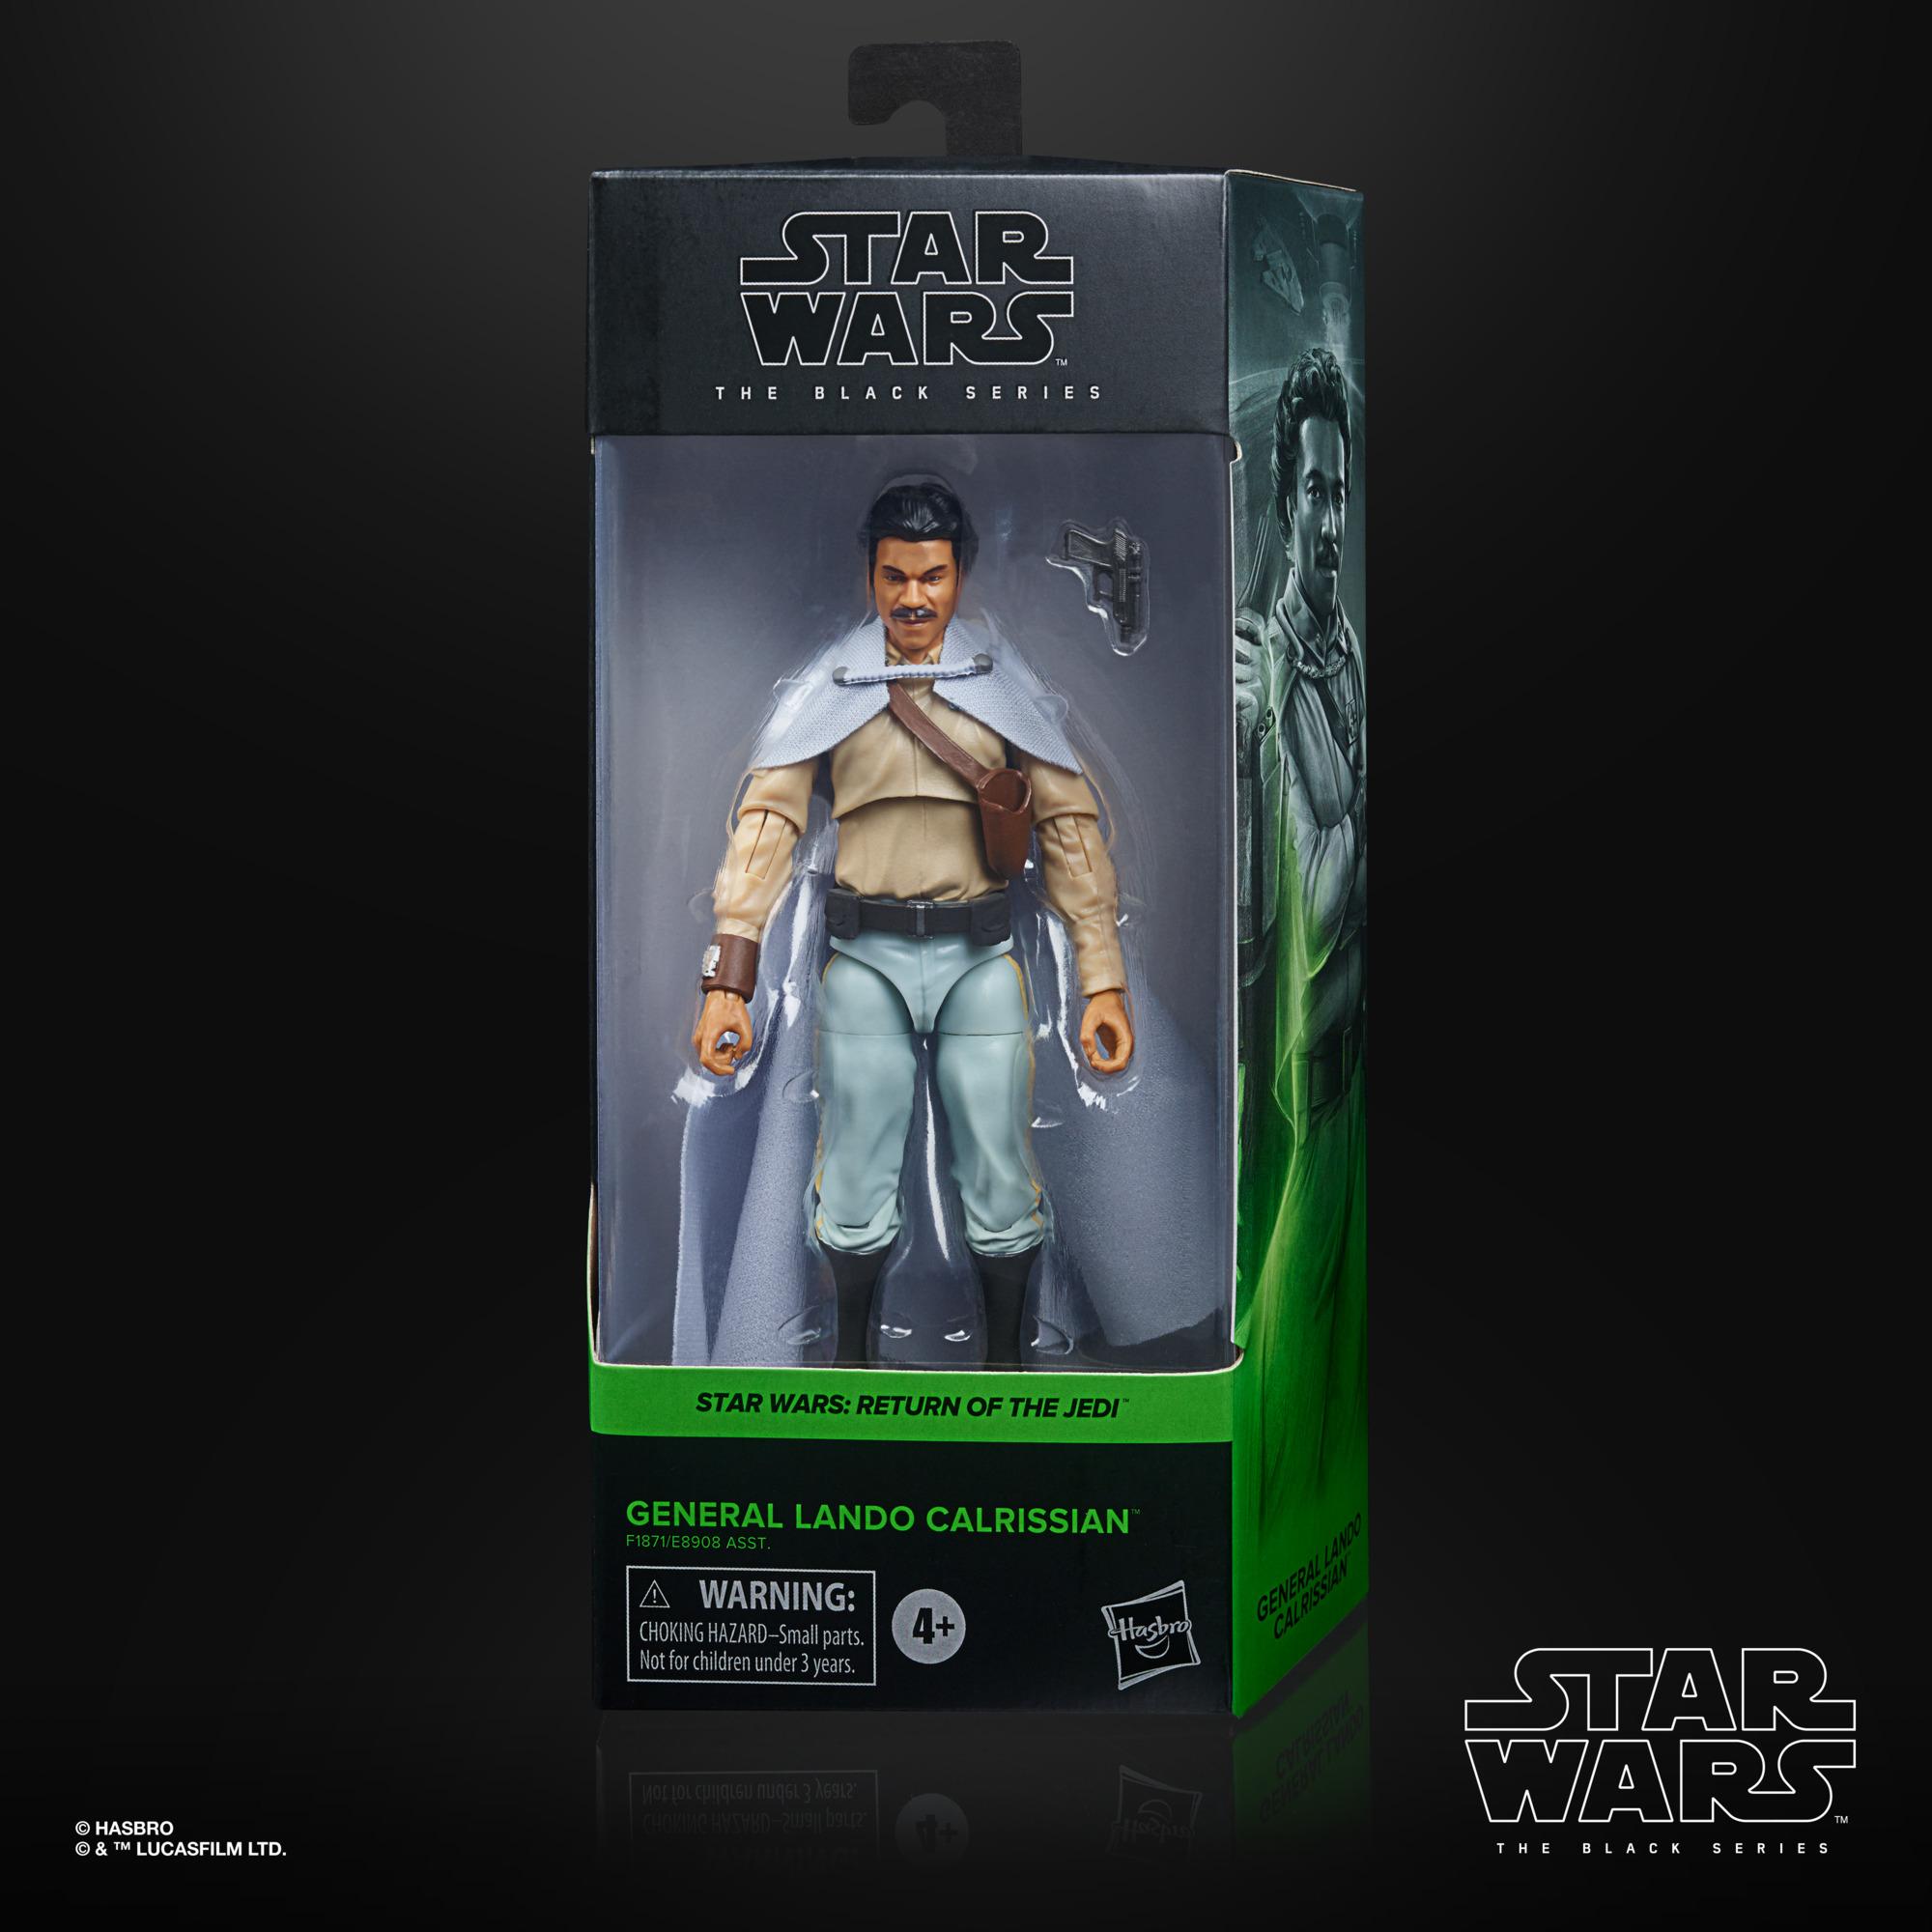 Star Wars - The Black Series - Return of the Jedi - General Lando Calrissian Action Figure